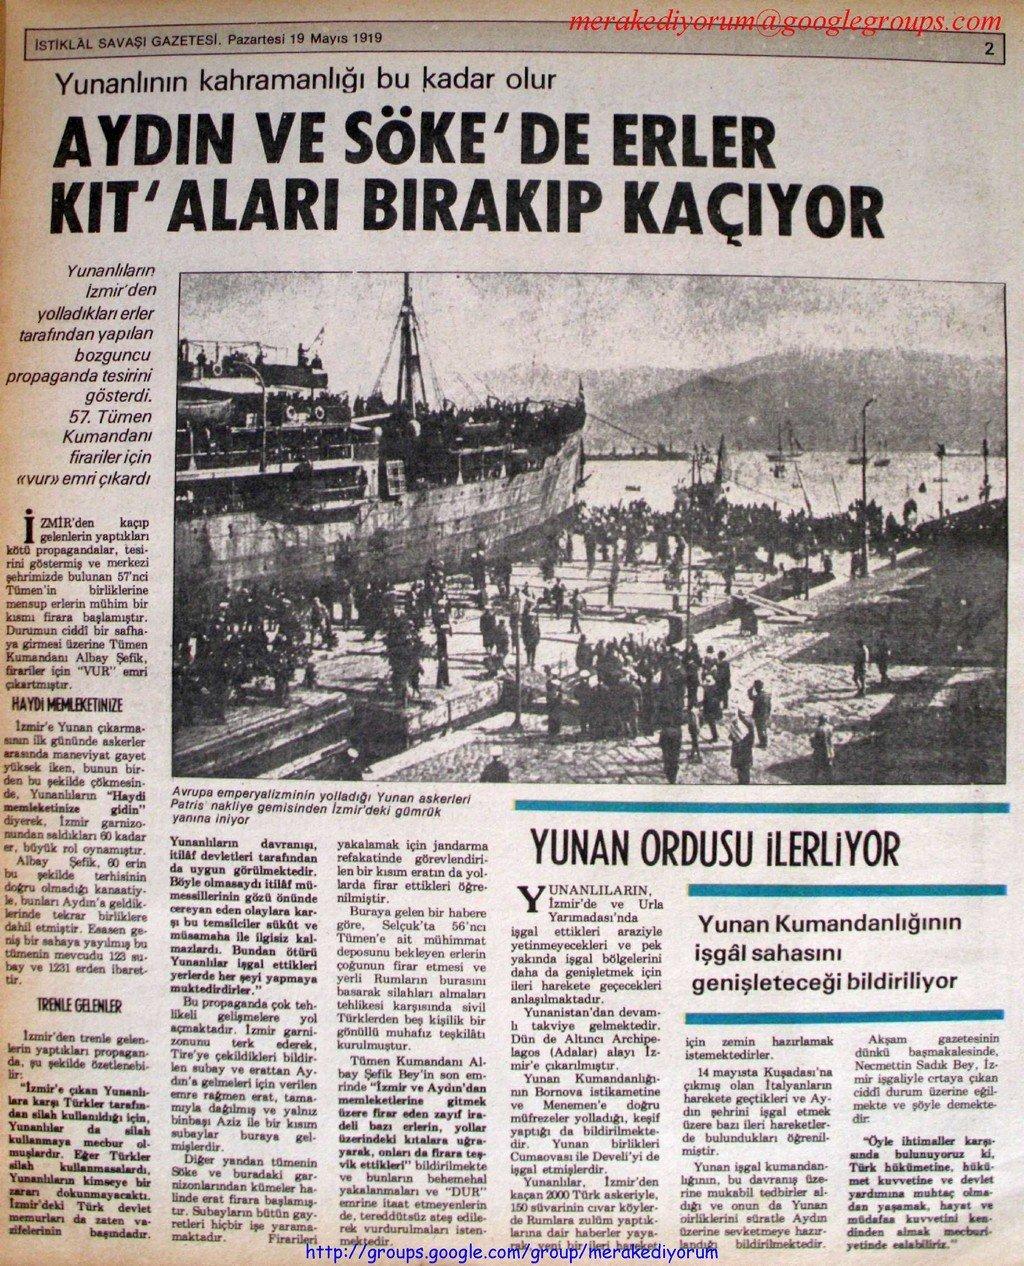 istiklal savaşı gazetesi - 19 mayıs 1919